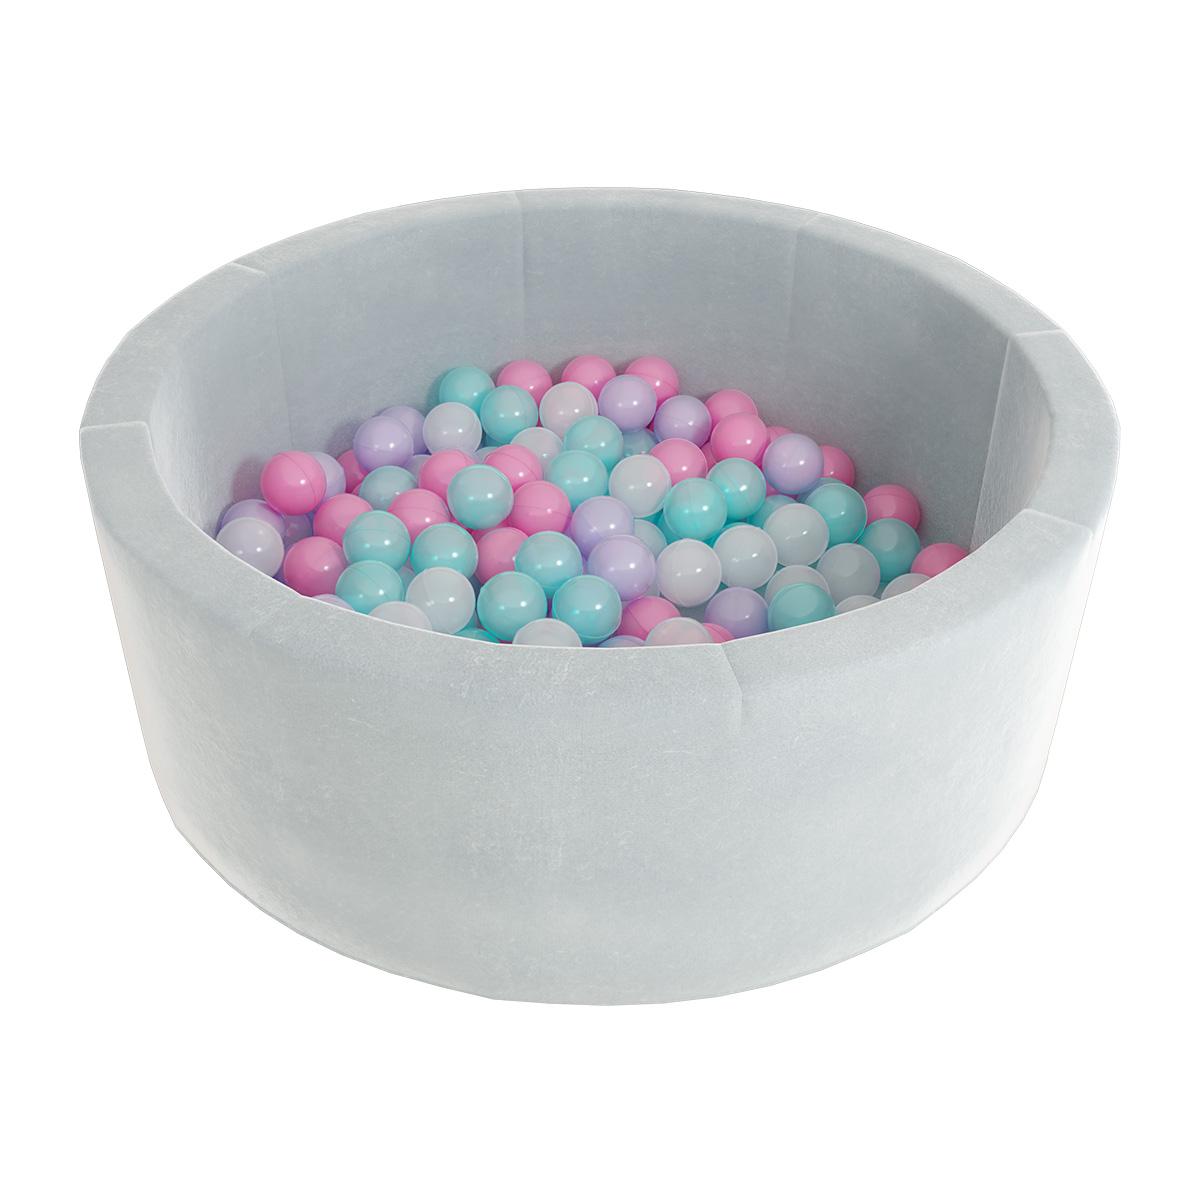 Купить Детский сухой бассейн Romana Airpool Max серый + 300 шаров, Romana (Романа)